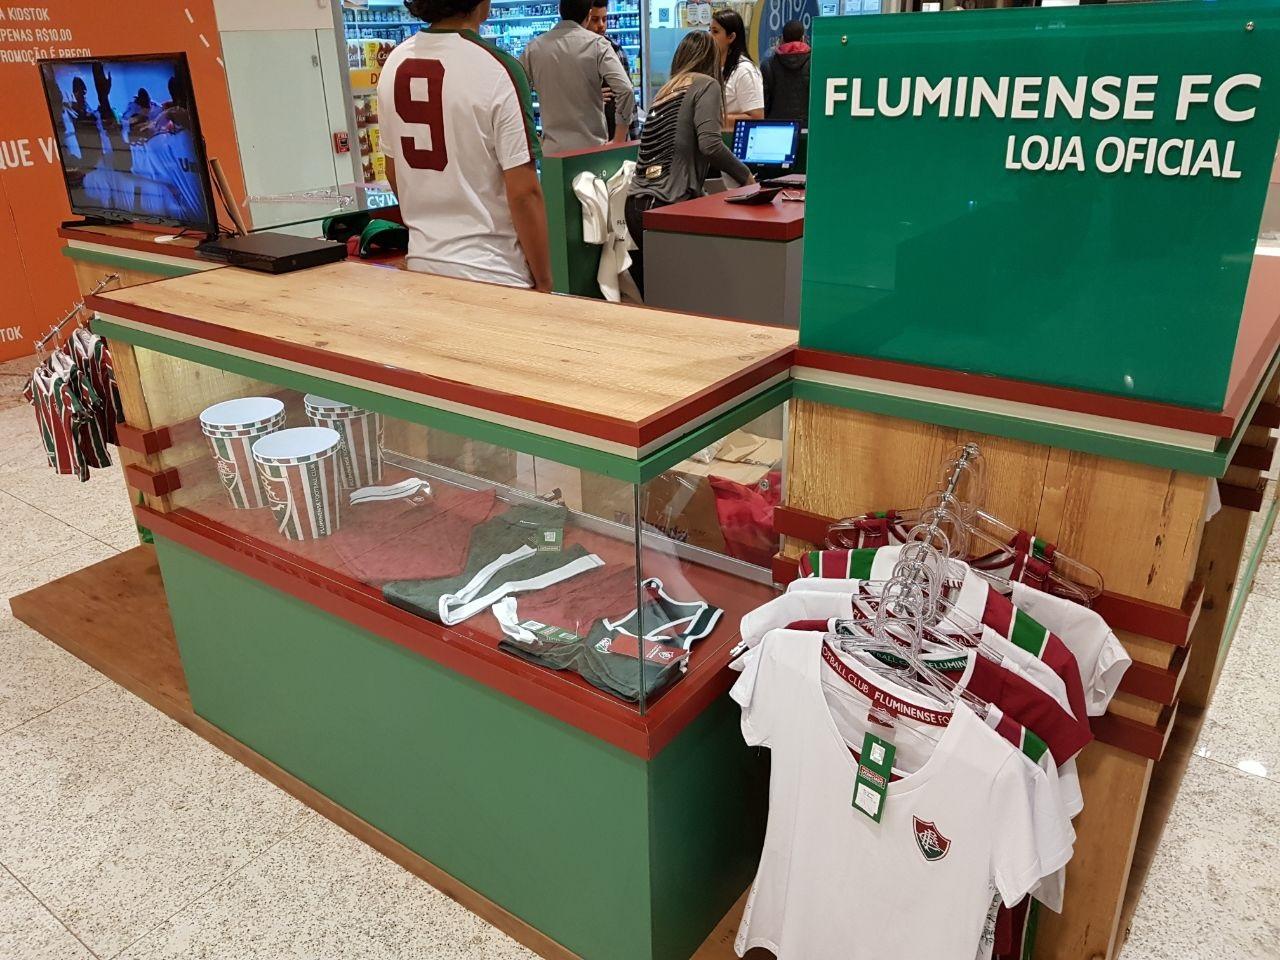 98b90aff5d Fluminense e Meltex Francising inauguram terceira loja oficial ...